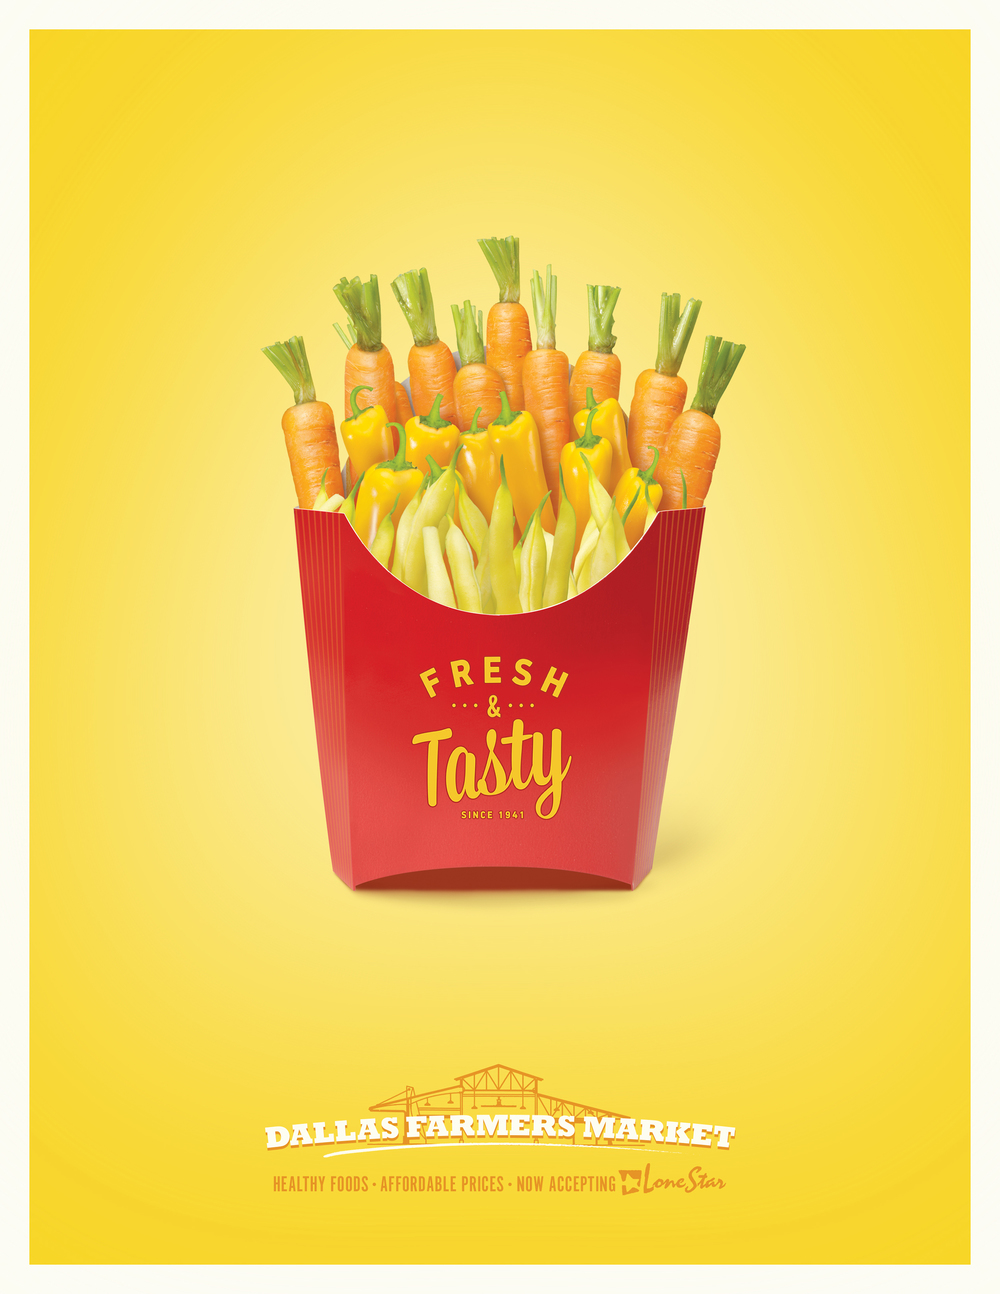 ryan-smith-creative-director-dallas-farmers-market-fries